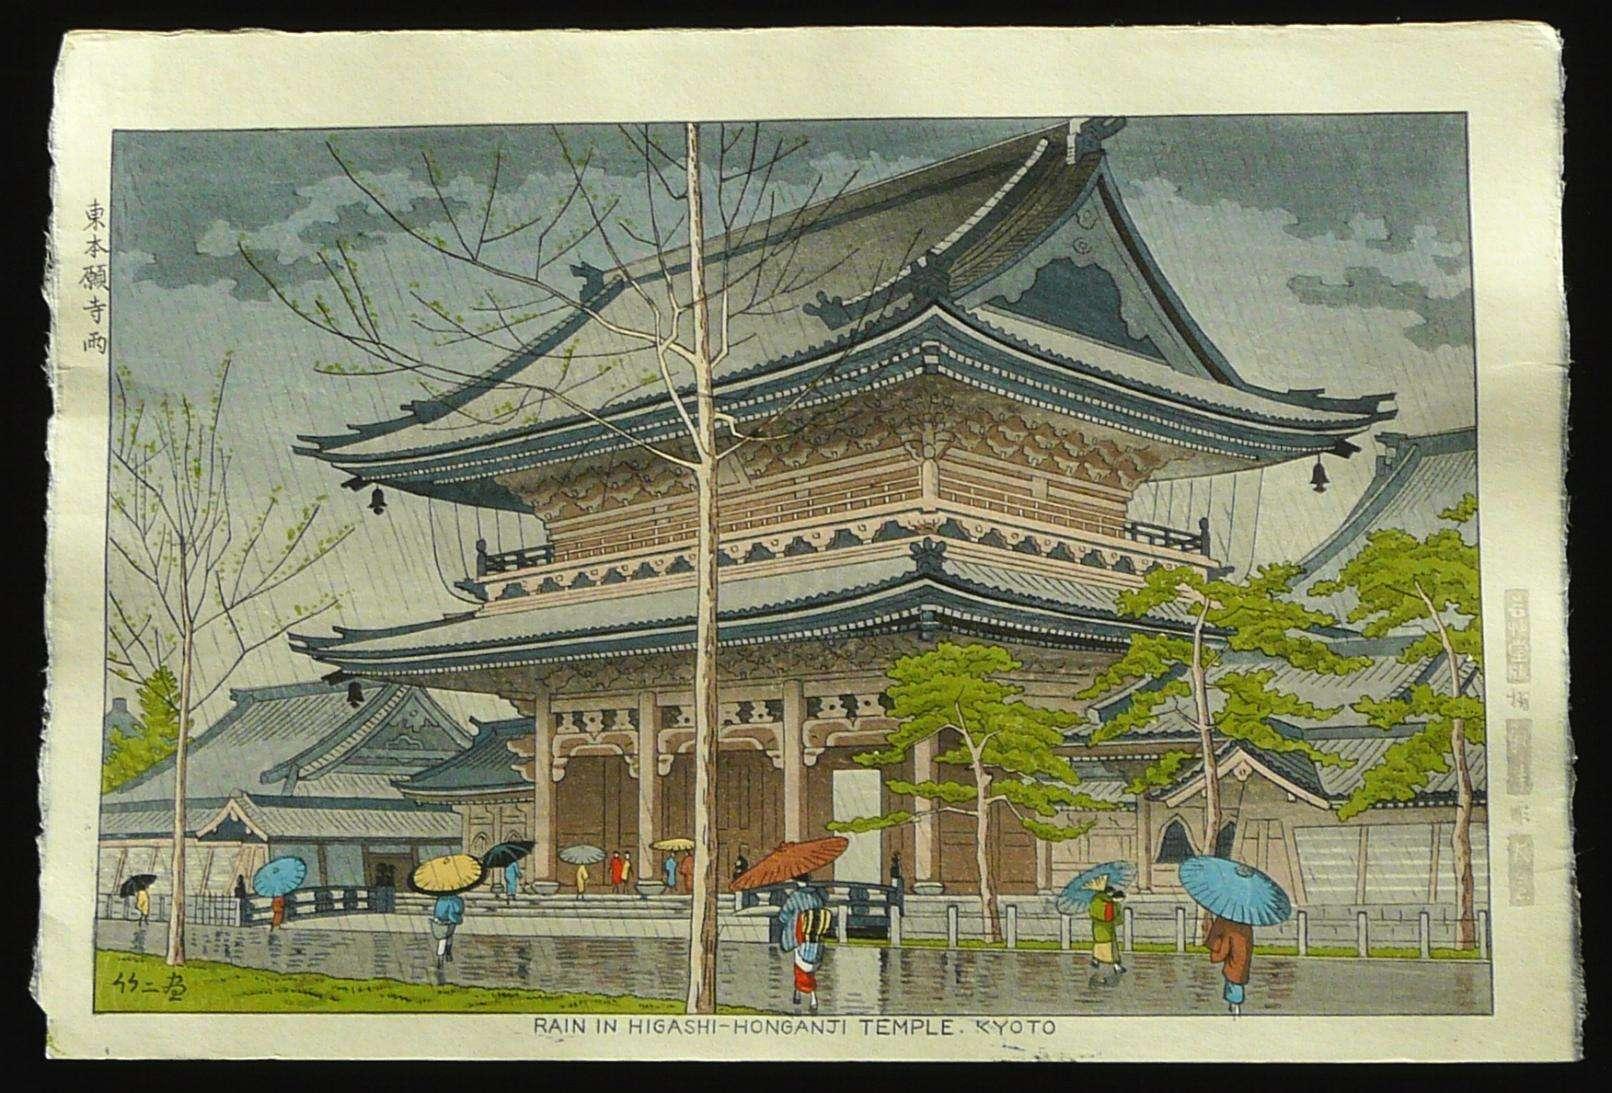 Takeji Asano: #P3781A RAIN IN HIGASHI - HONGANJI TEMPLE, KYOTO